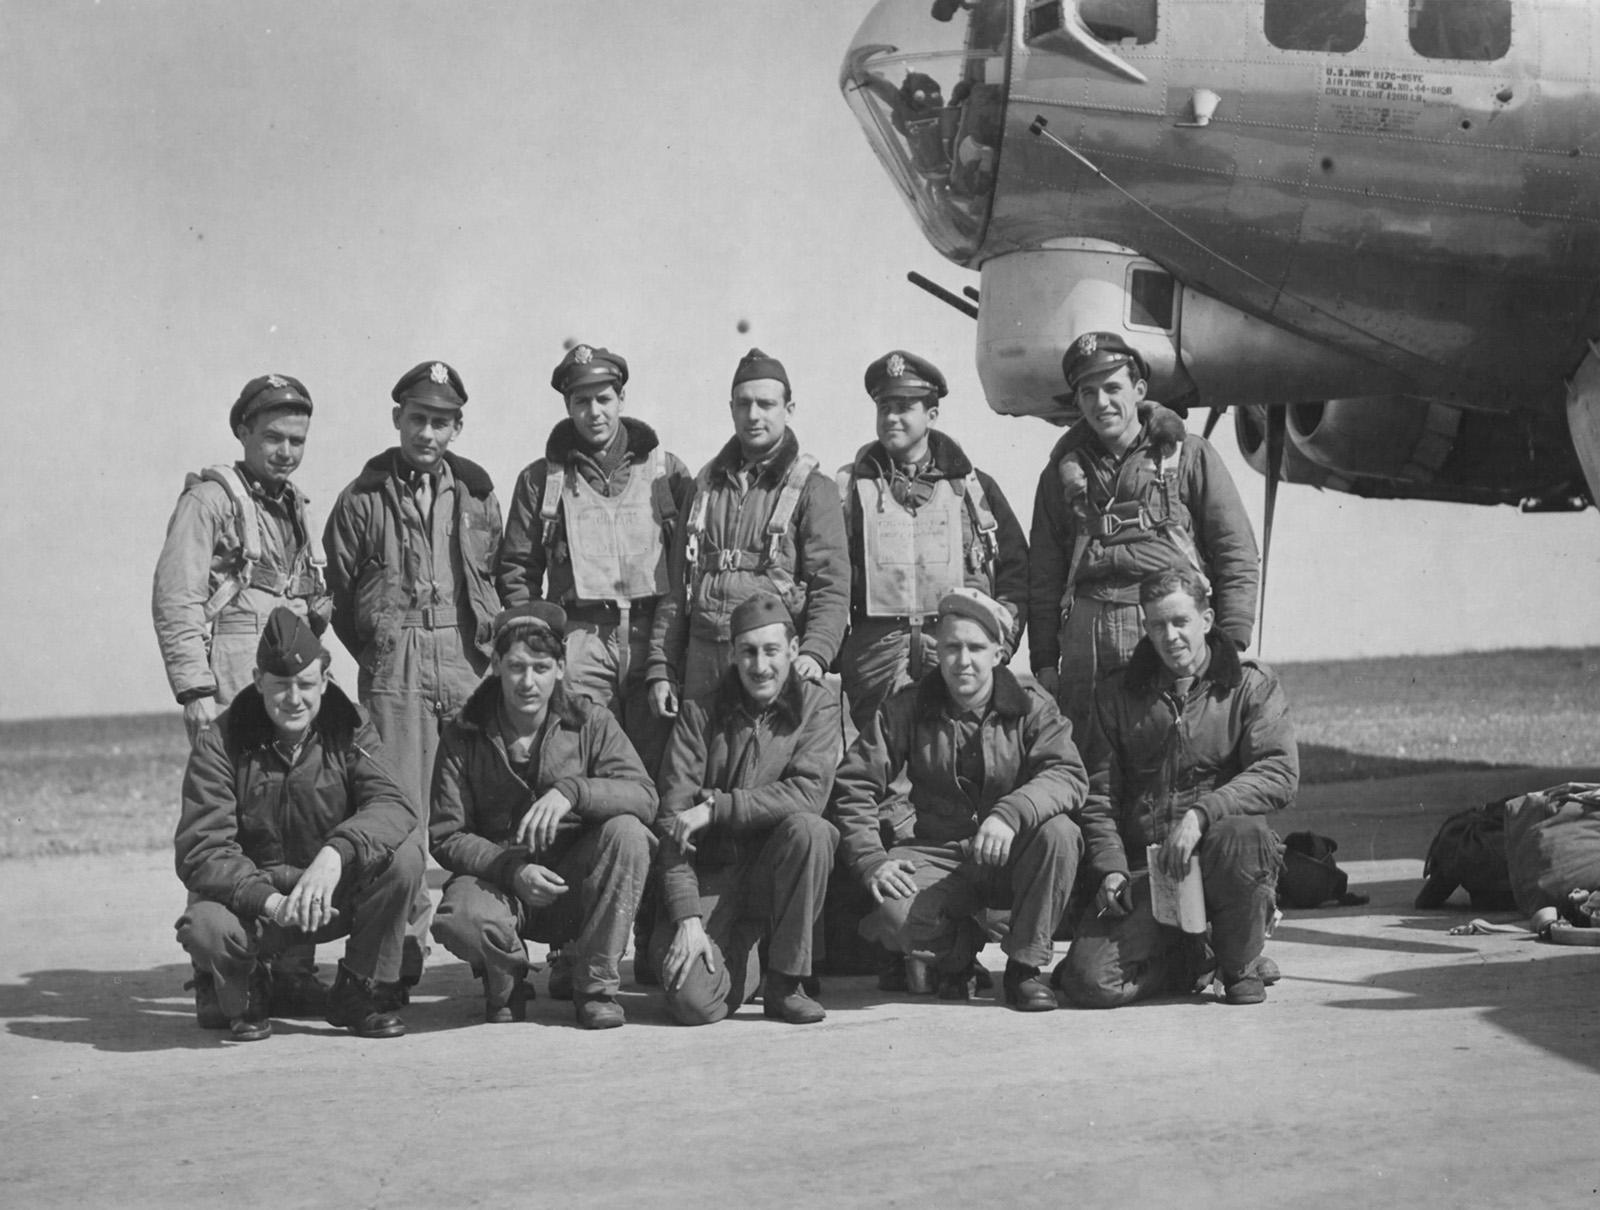 B-17 #44-8828